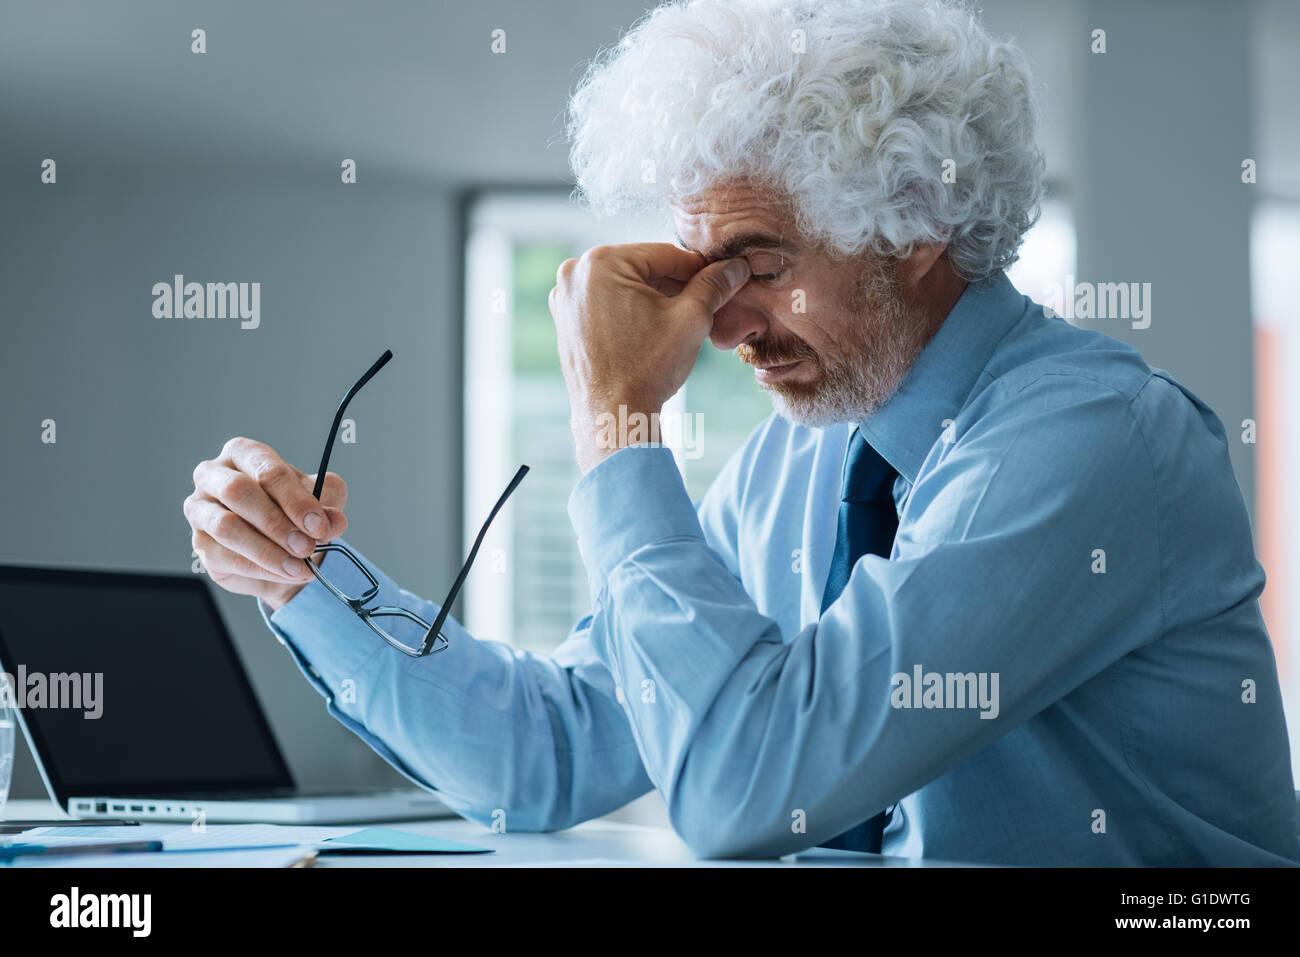 Erschöpften Geschäftsmann sitzt am Schreibtisch, Ausfall und Verlust Bürokonzept betont Stockbild